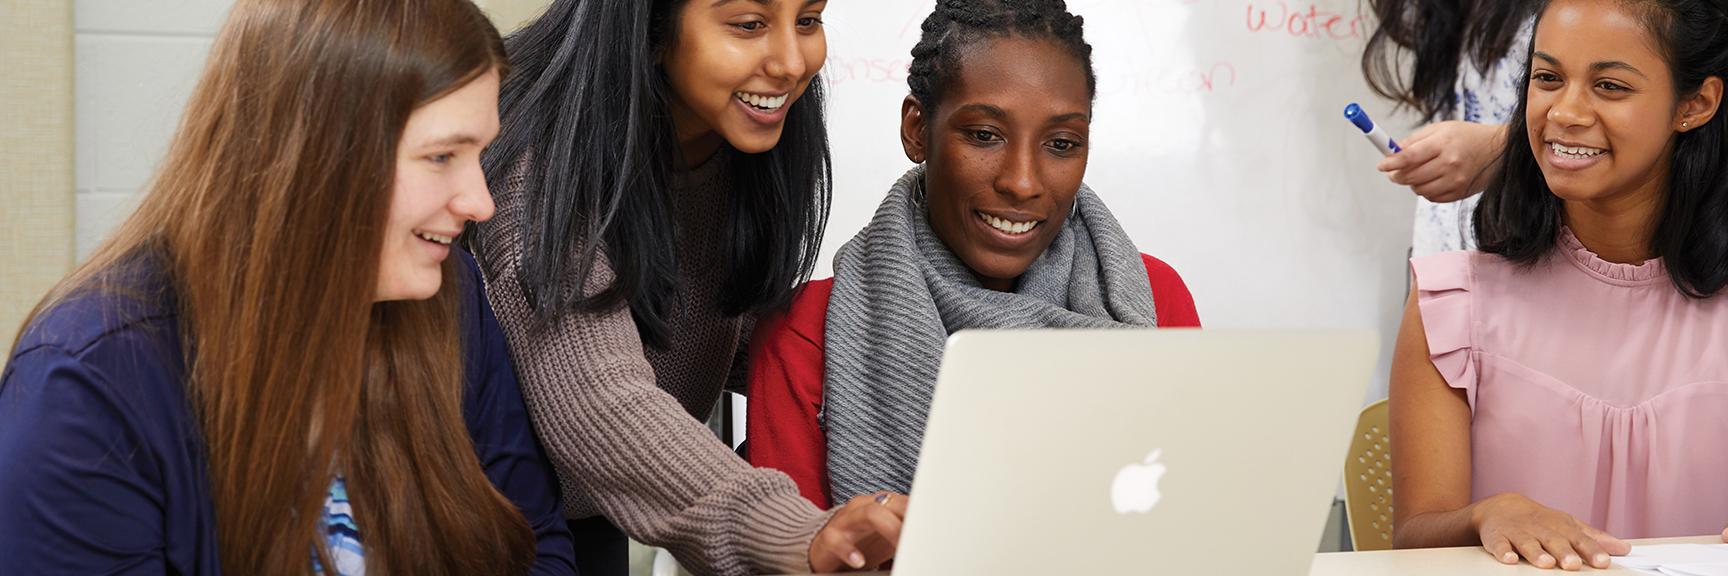 Students huddled around a laptop